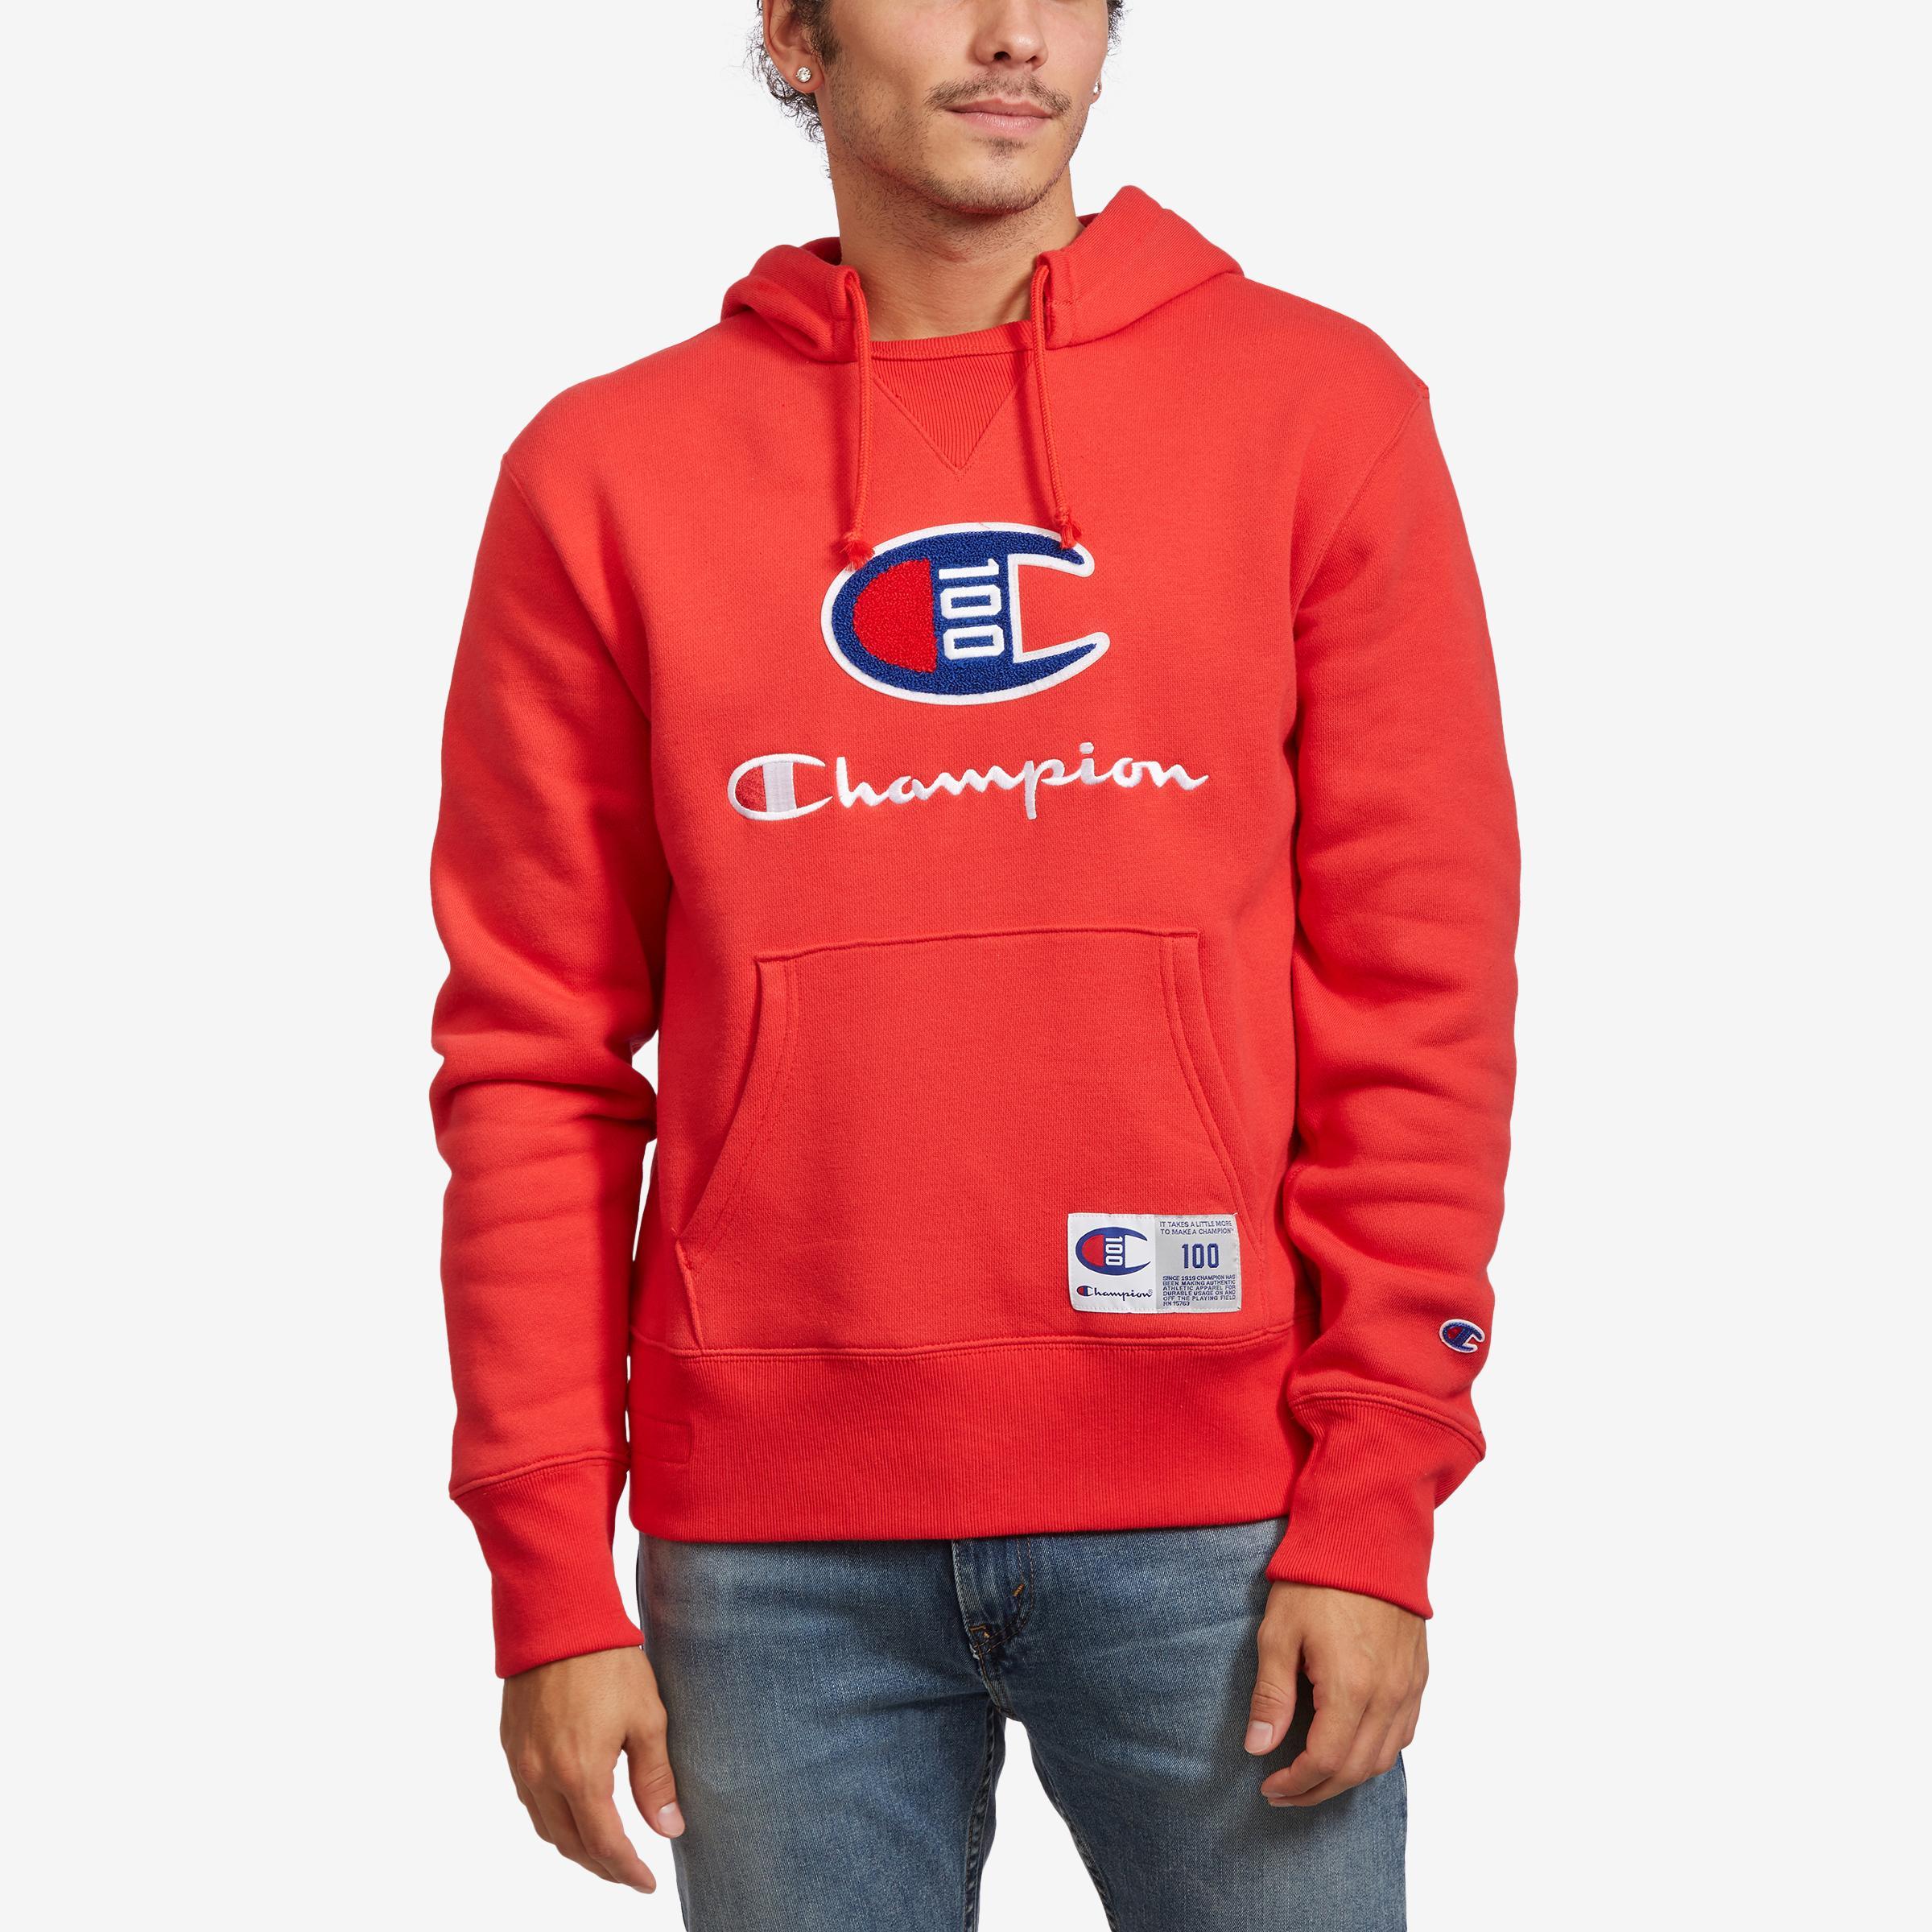 Century Collection Hoodie, C100 Felt Logo